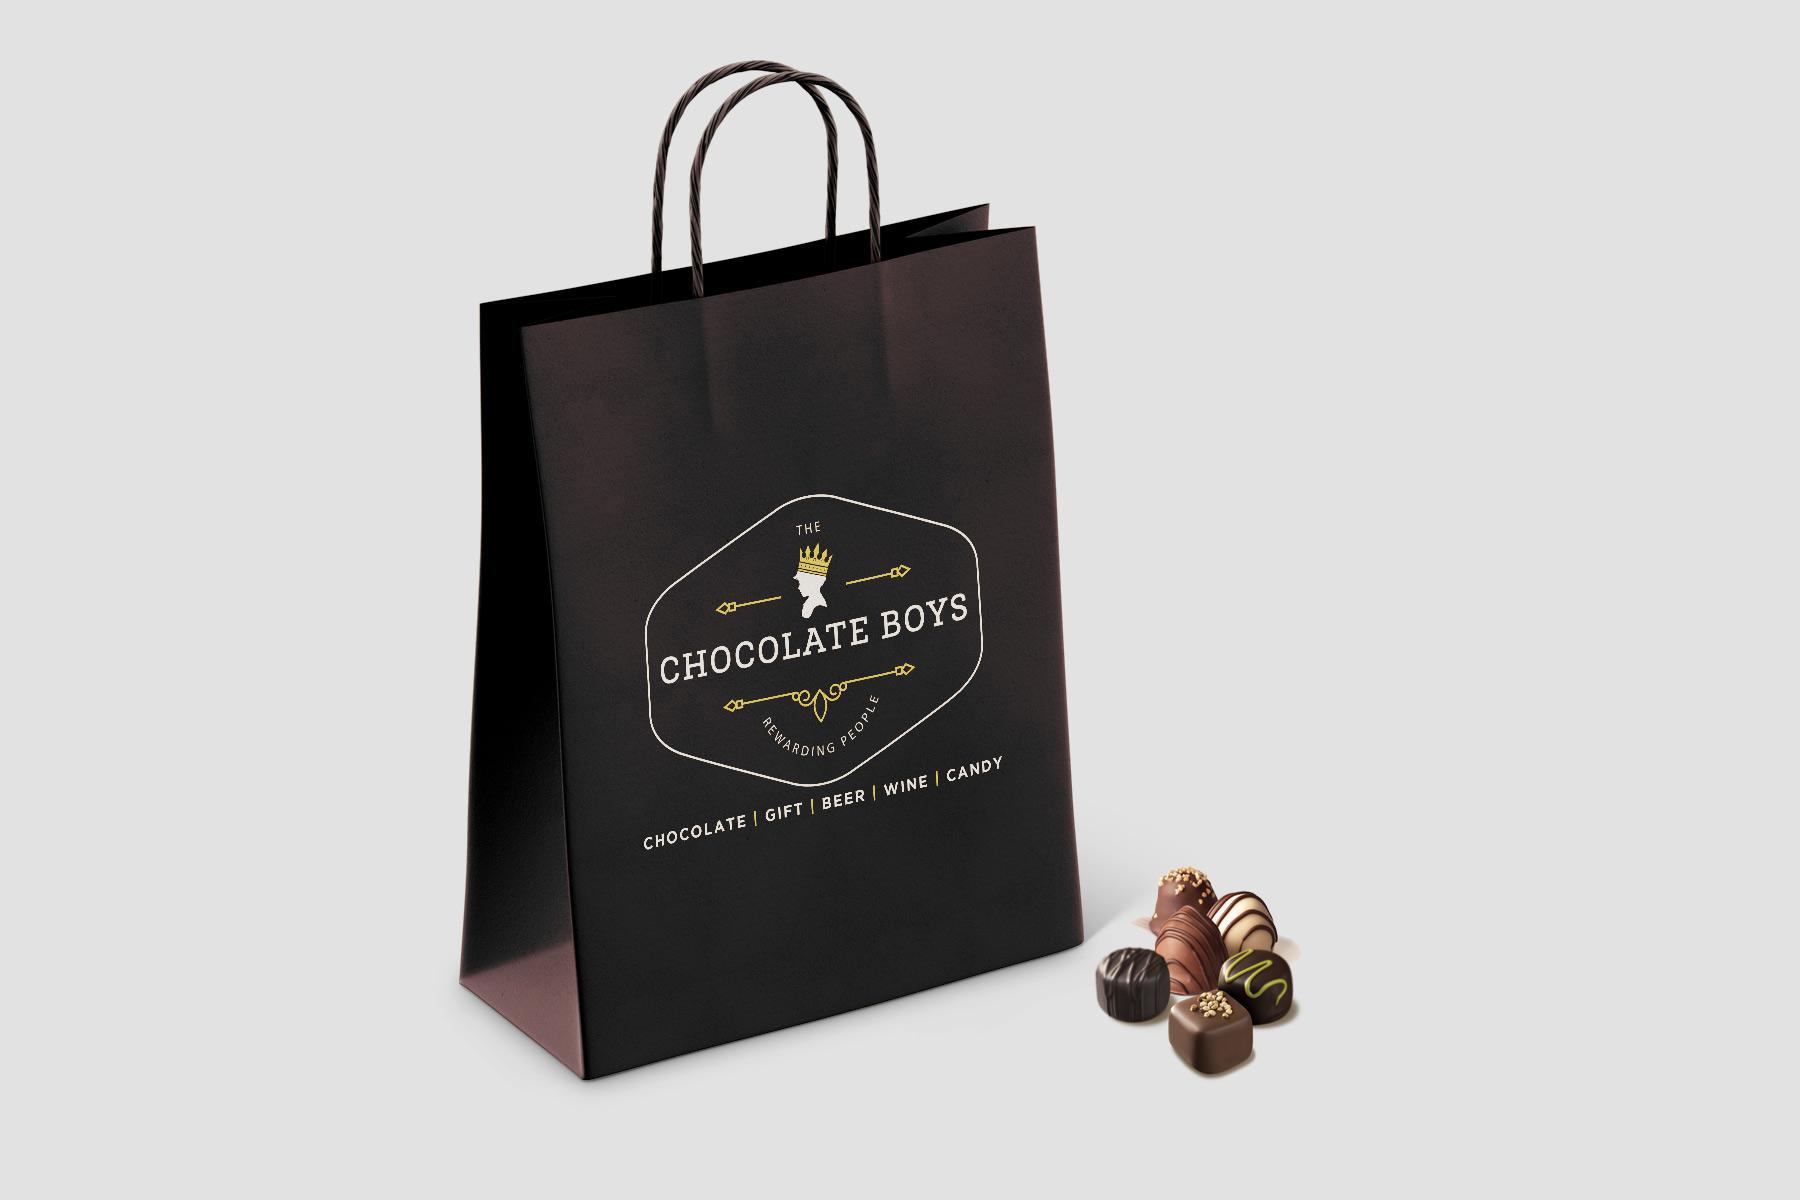 chocolate_boys_bags